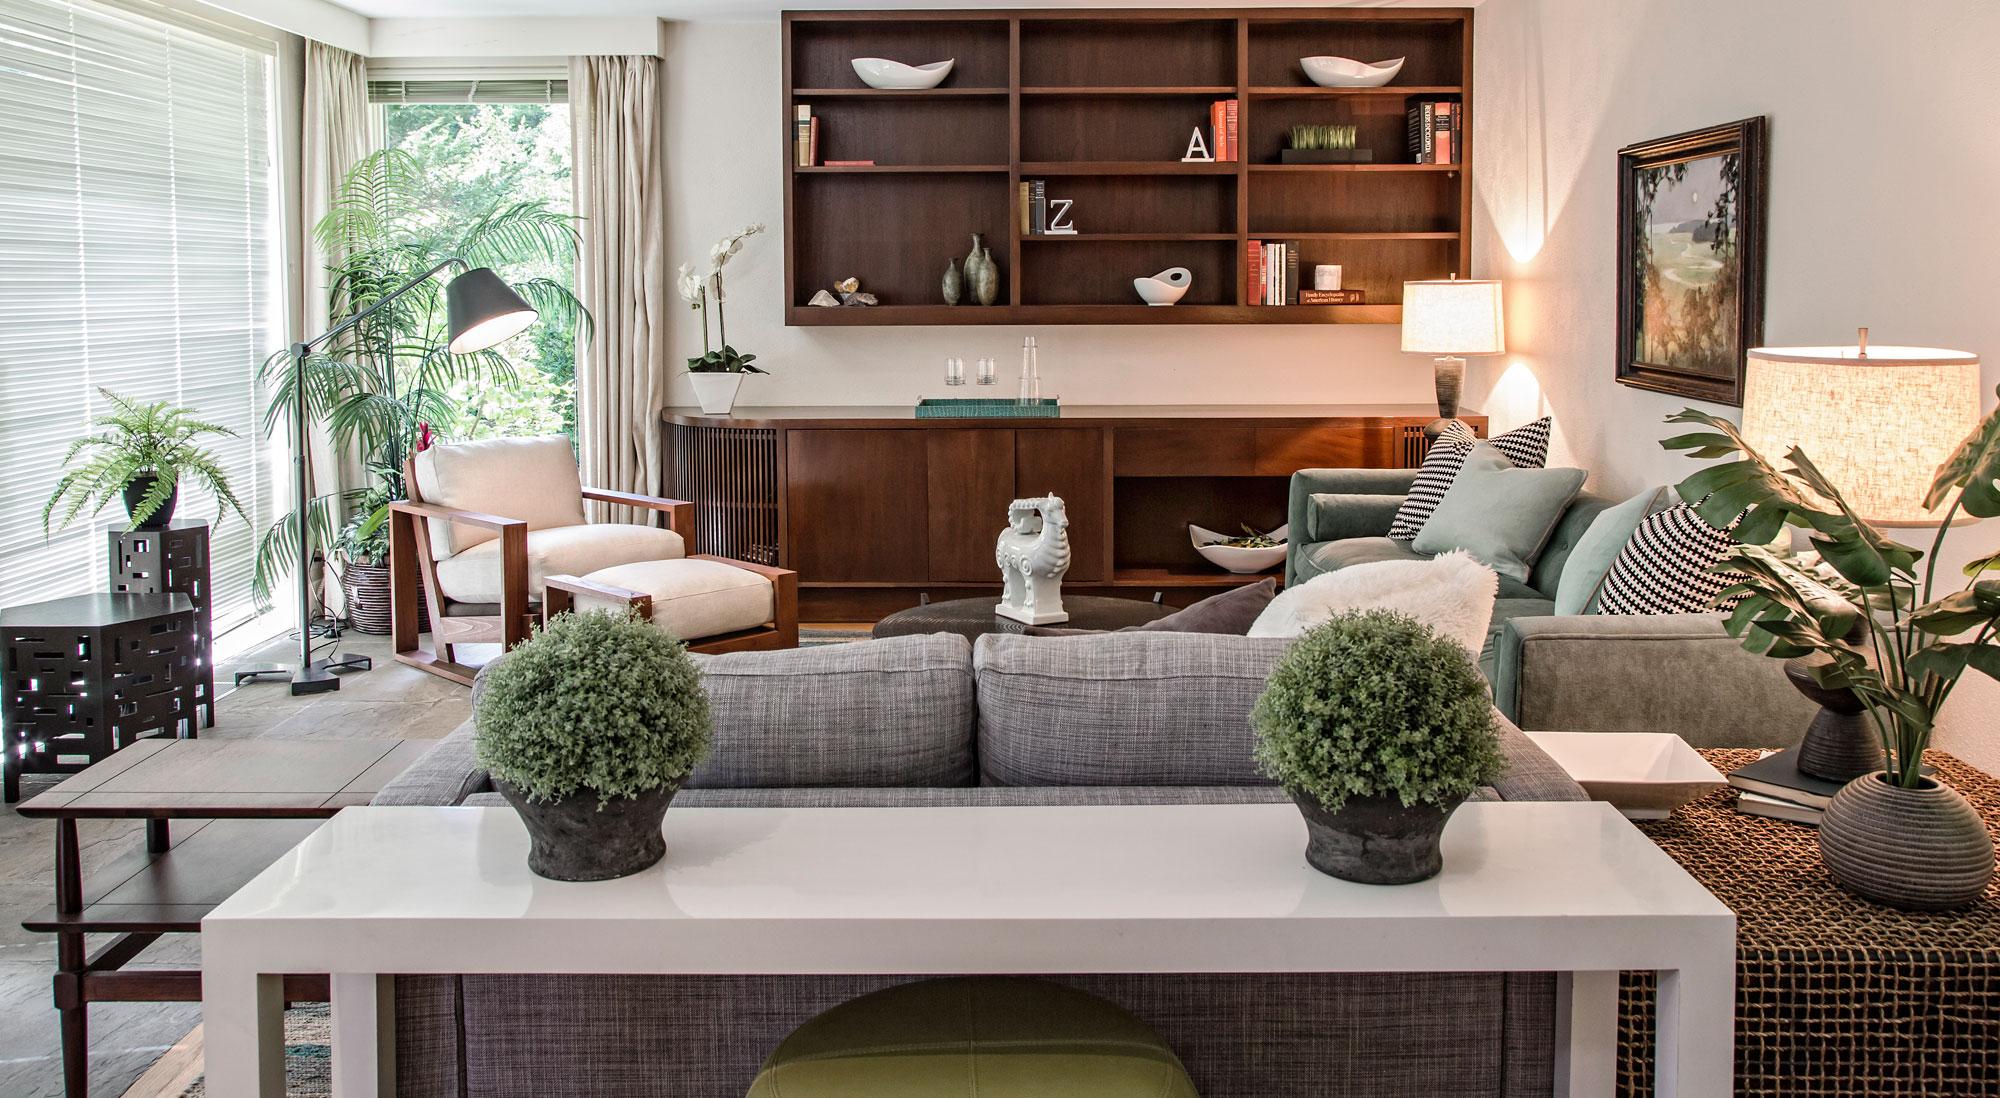 Heidi Pribell Interior Designer Boston Ma Living Room Table Plants Couch